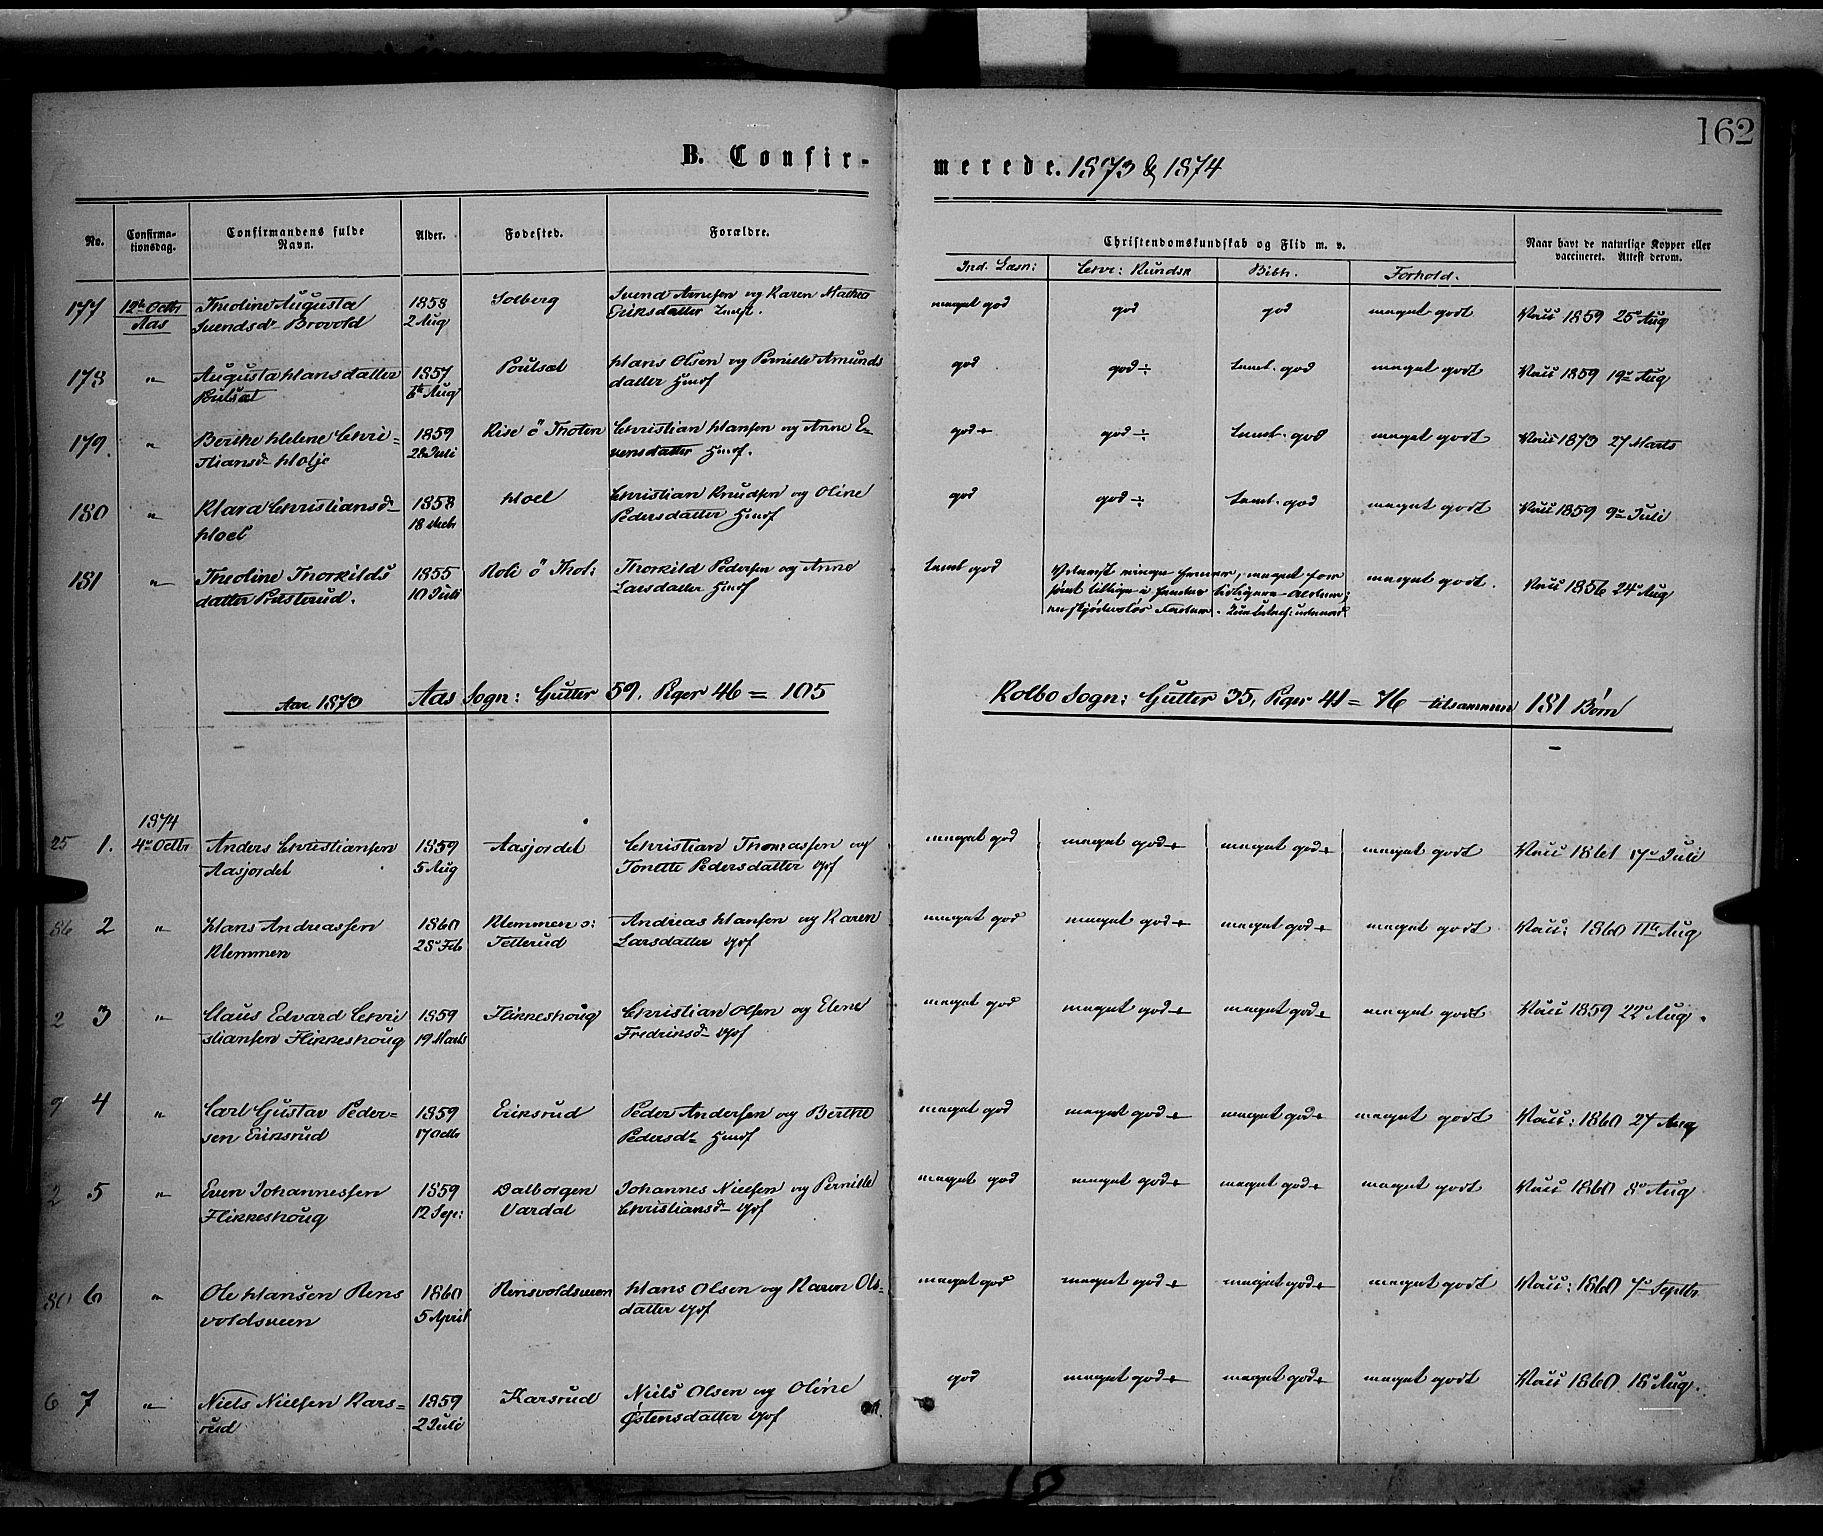 SAH, Vestre Toten prestekontor, H/Ha/Haa/L0008: Ministerialbok nr. 8, 1870-1877, s. 162